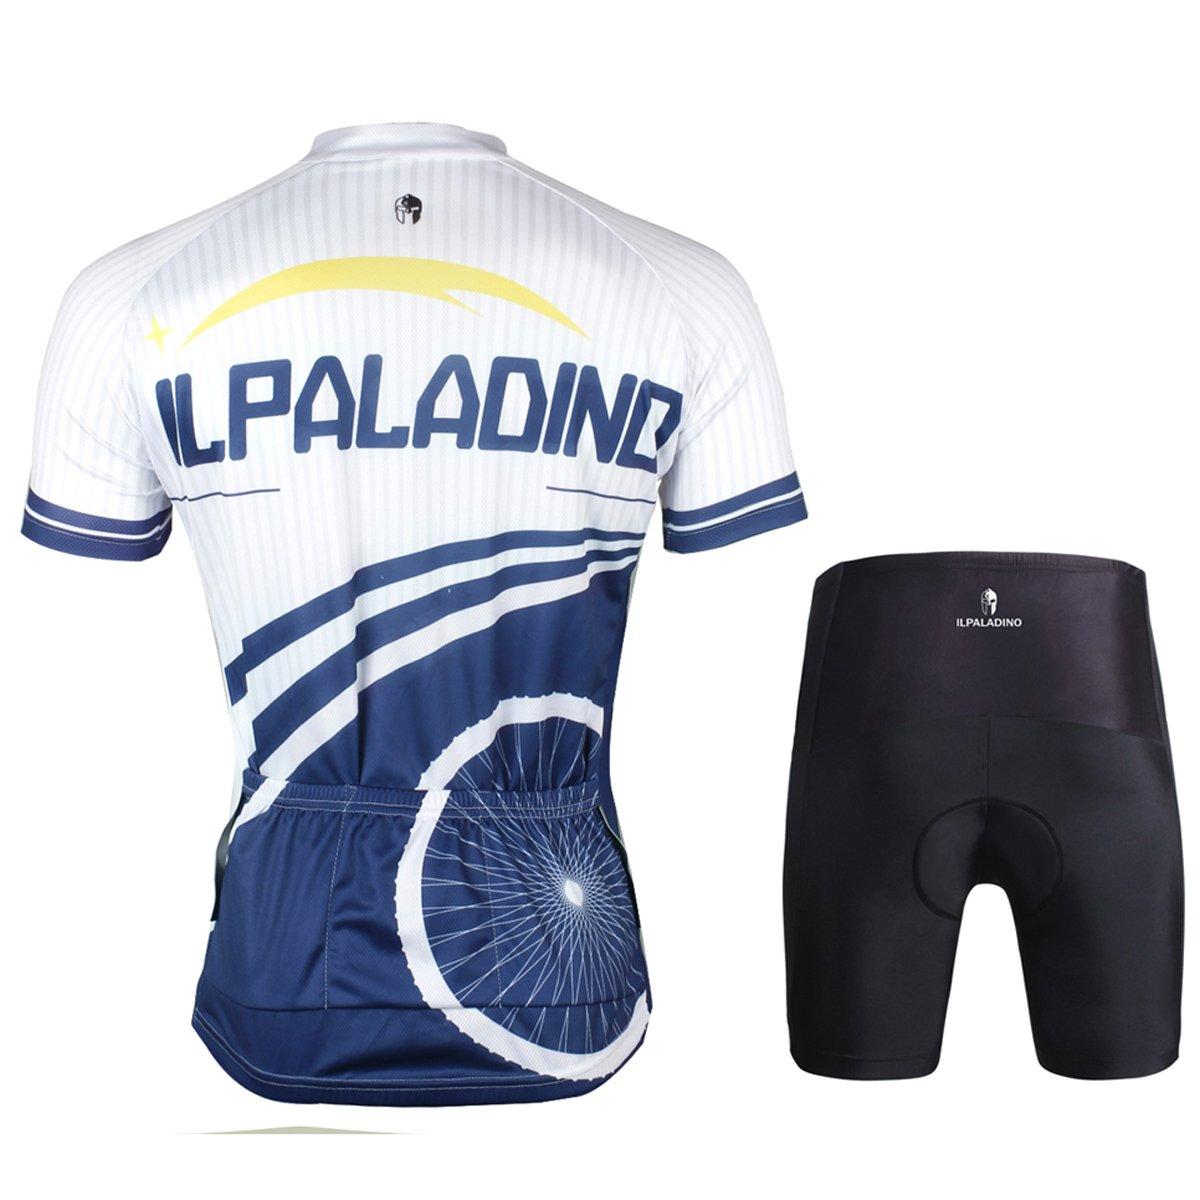 ffb0976bb Amazon.com   Ilpaladino Men s Cycling Shirts Short Sleeve for Outdoor Sports  Custom Bike Jerseys Tight Design   Sports   Outdoors